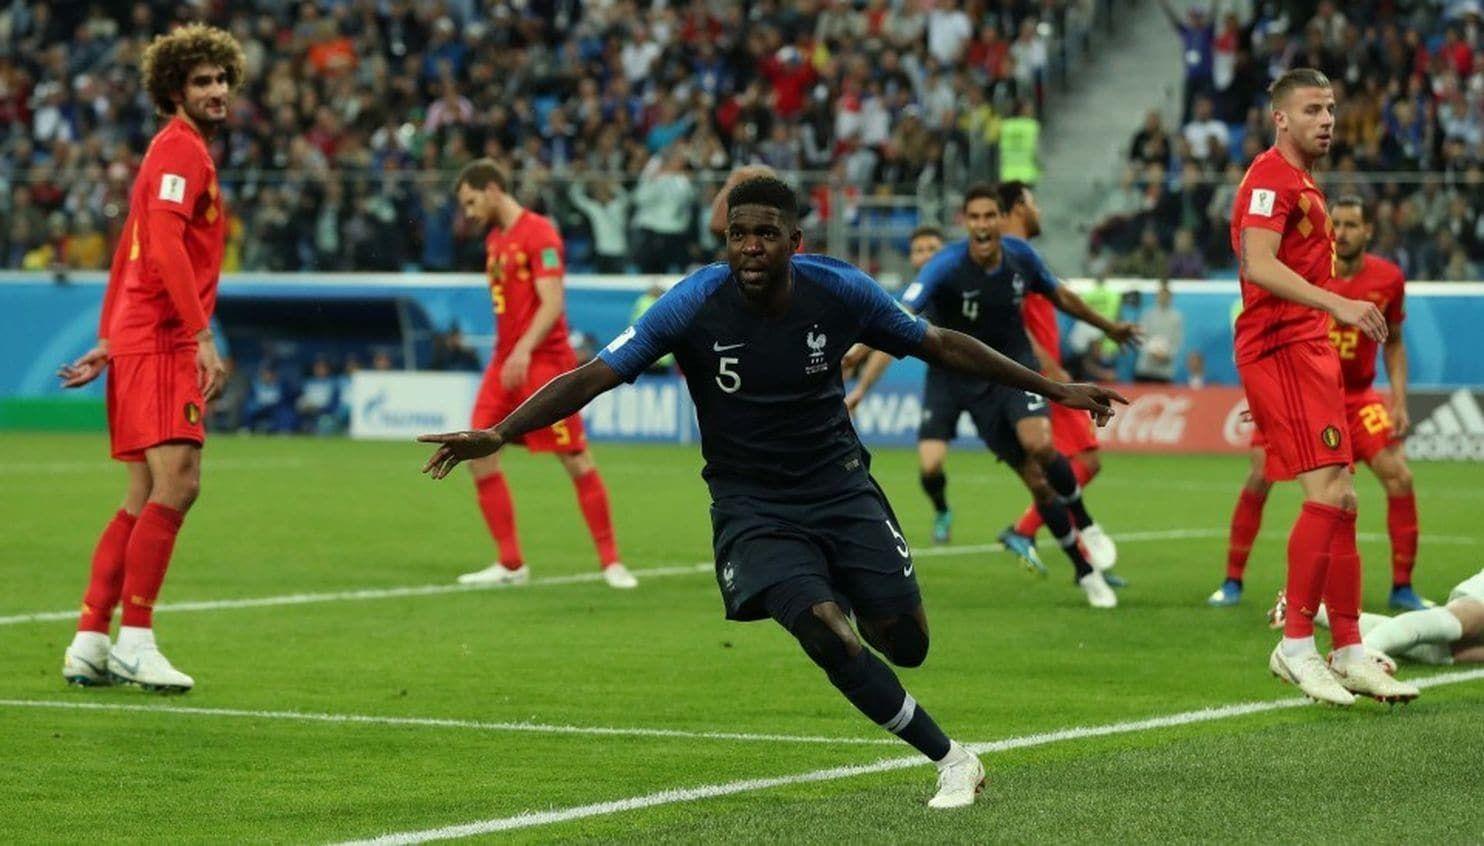 e99dc2b8d France vs. Belgium 2018 World Cup final score and recap - The Washington  Post